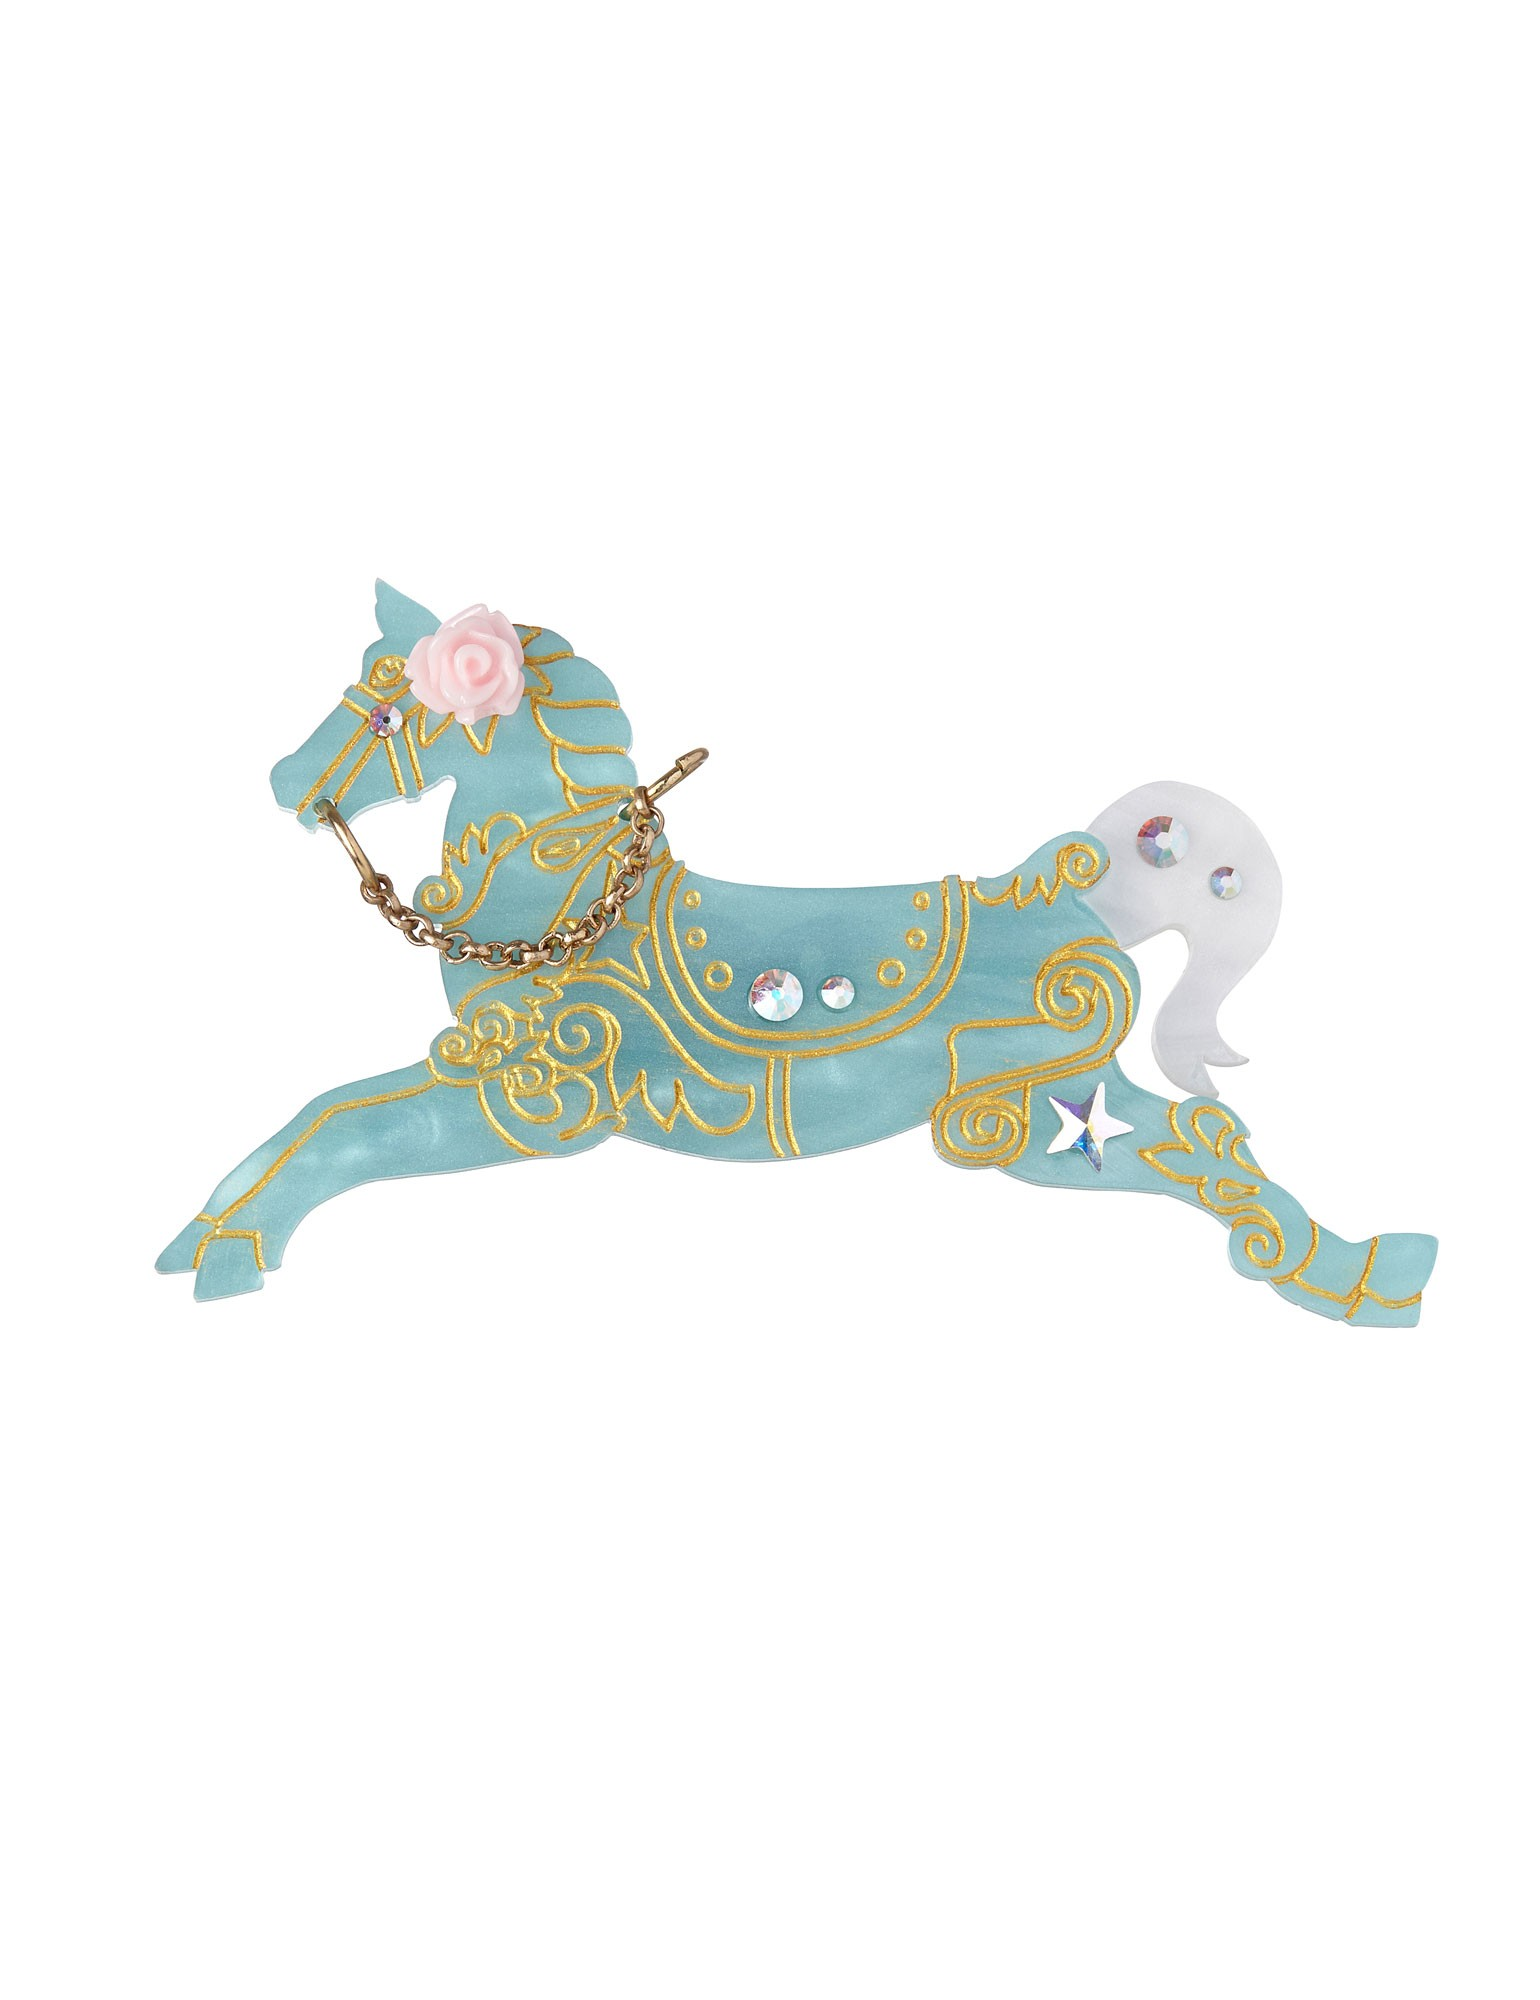 tatty-devine-carousel-horse-brooch-buy-tatty-devine-online-1.jpg